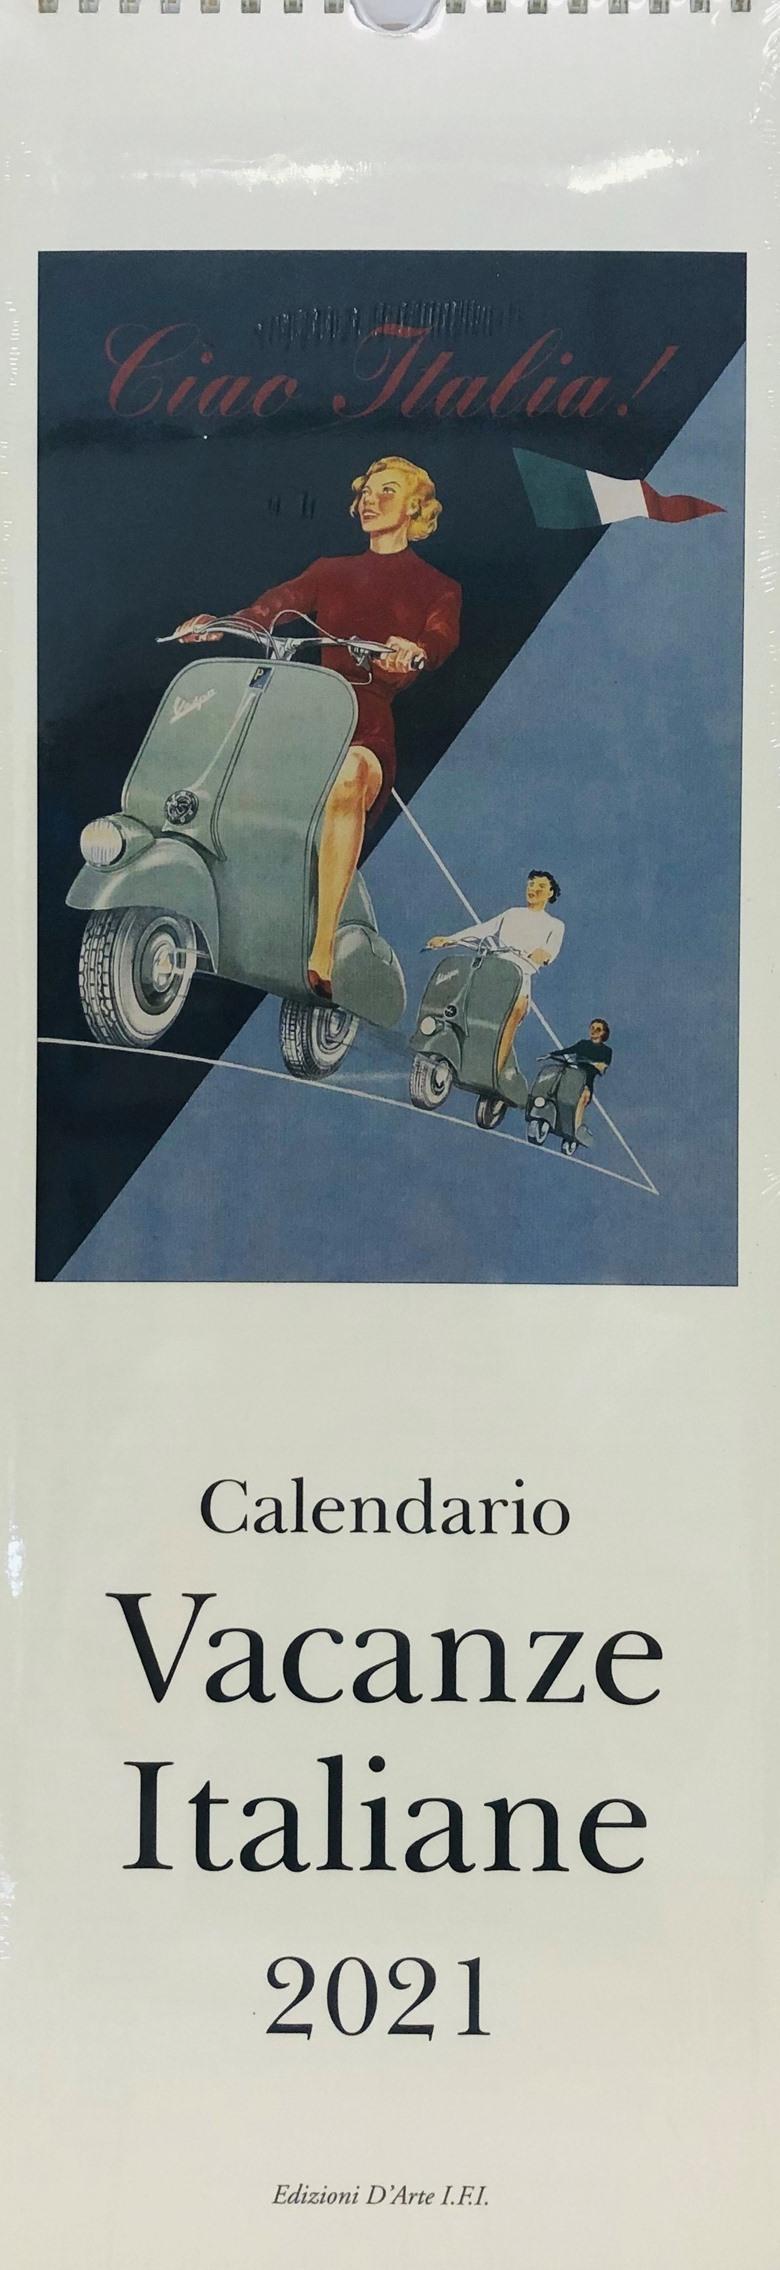 Italian Long Calendar Vacanze Italiane 2021 | CALE3818